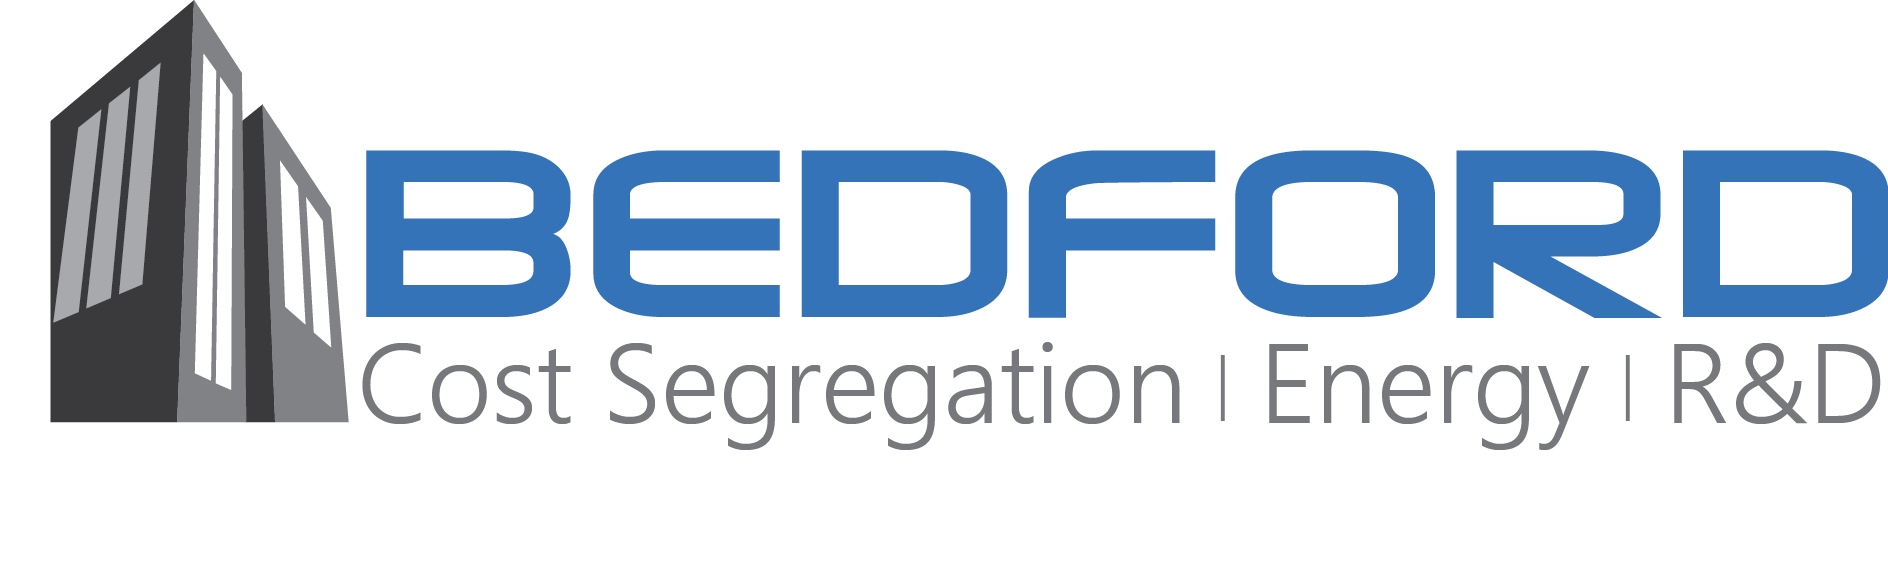 Bedford Cost Segregation